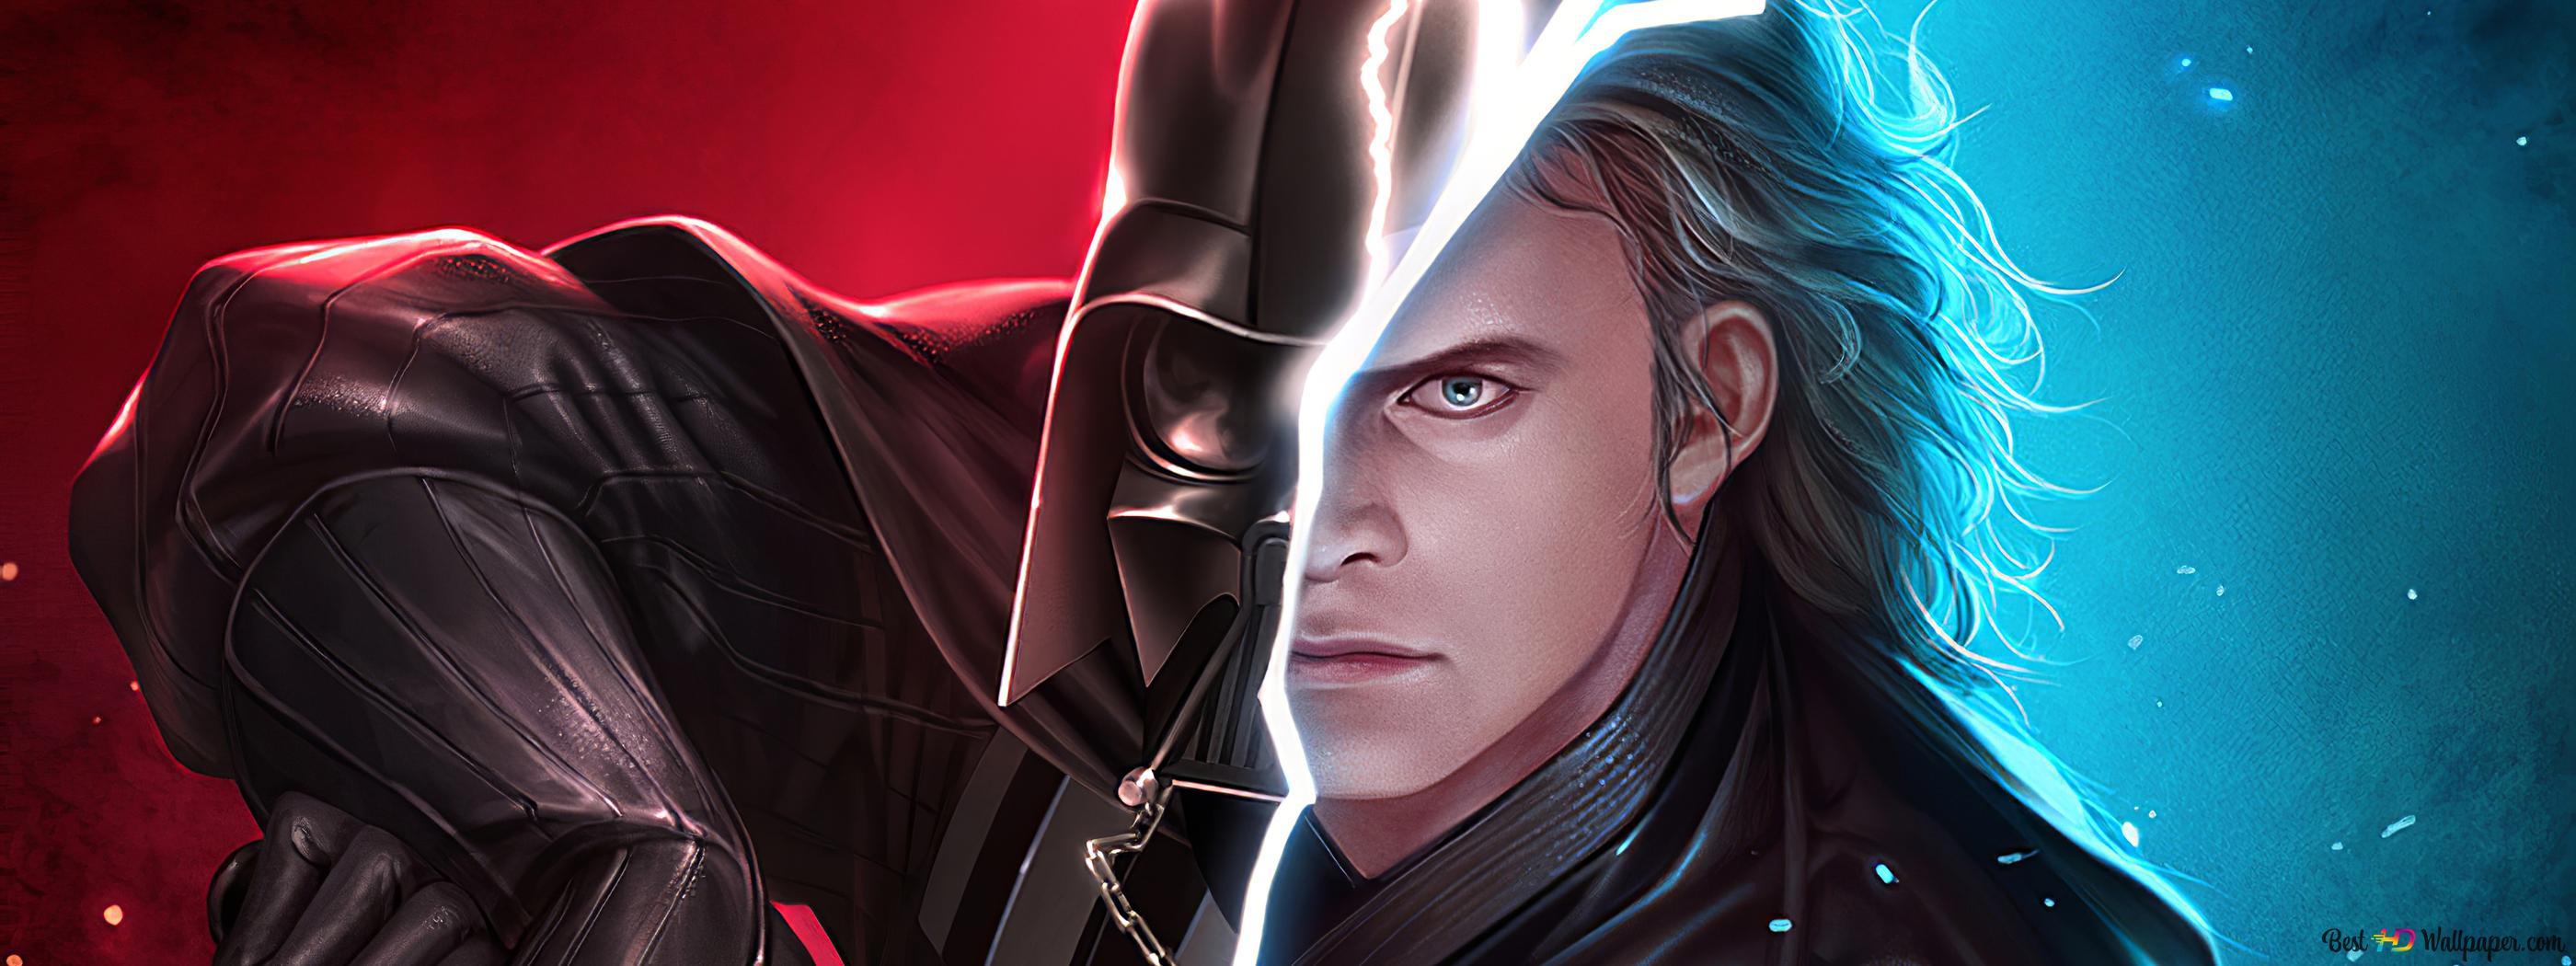 Darth Vader Anakin Skywalker Hd Wallpaper Download